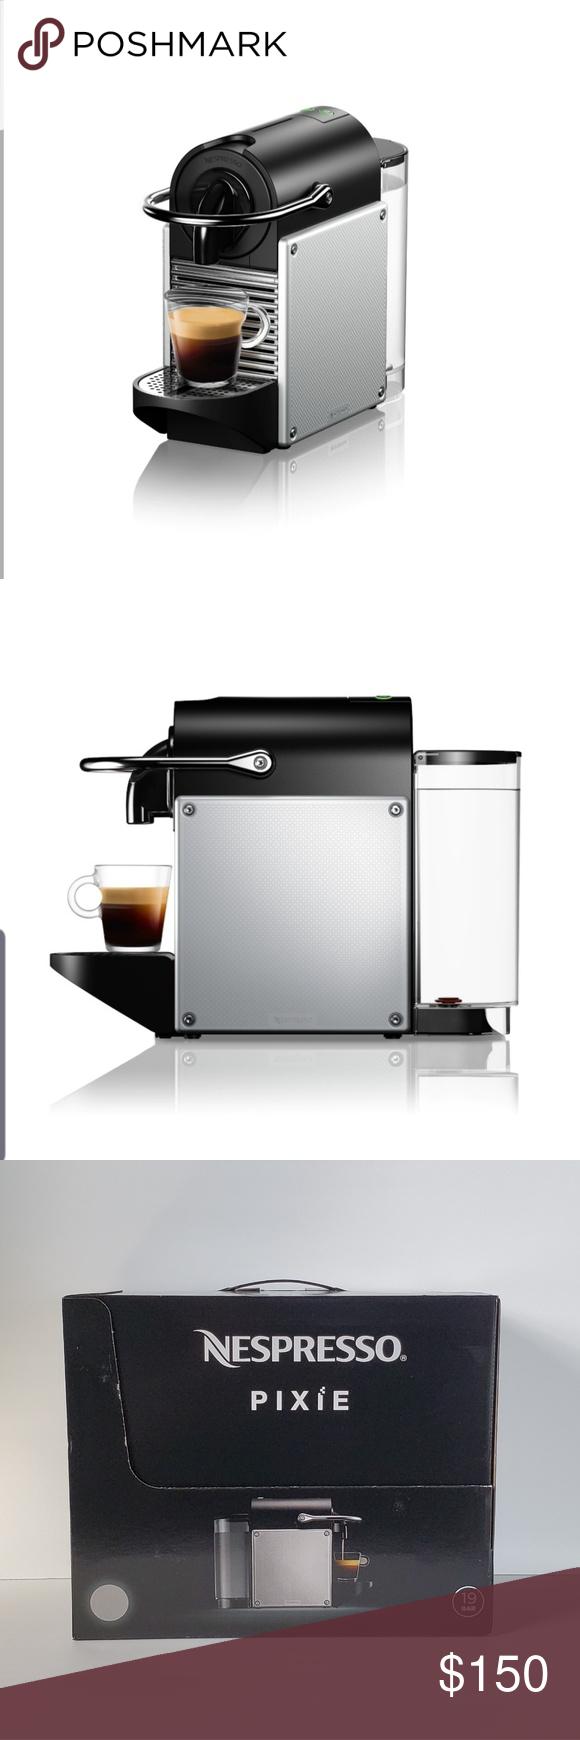 Nespresso Pixie Single Cup Coffee Maker New in Box Brand